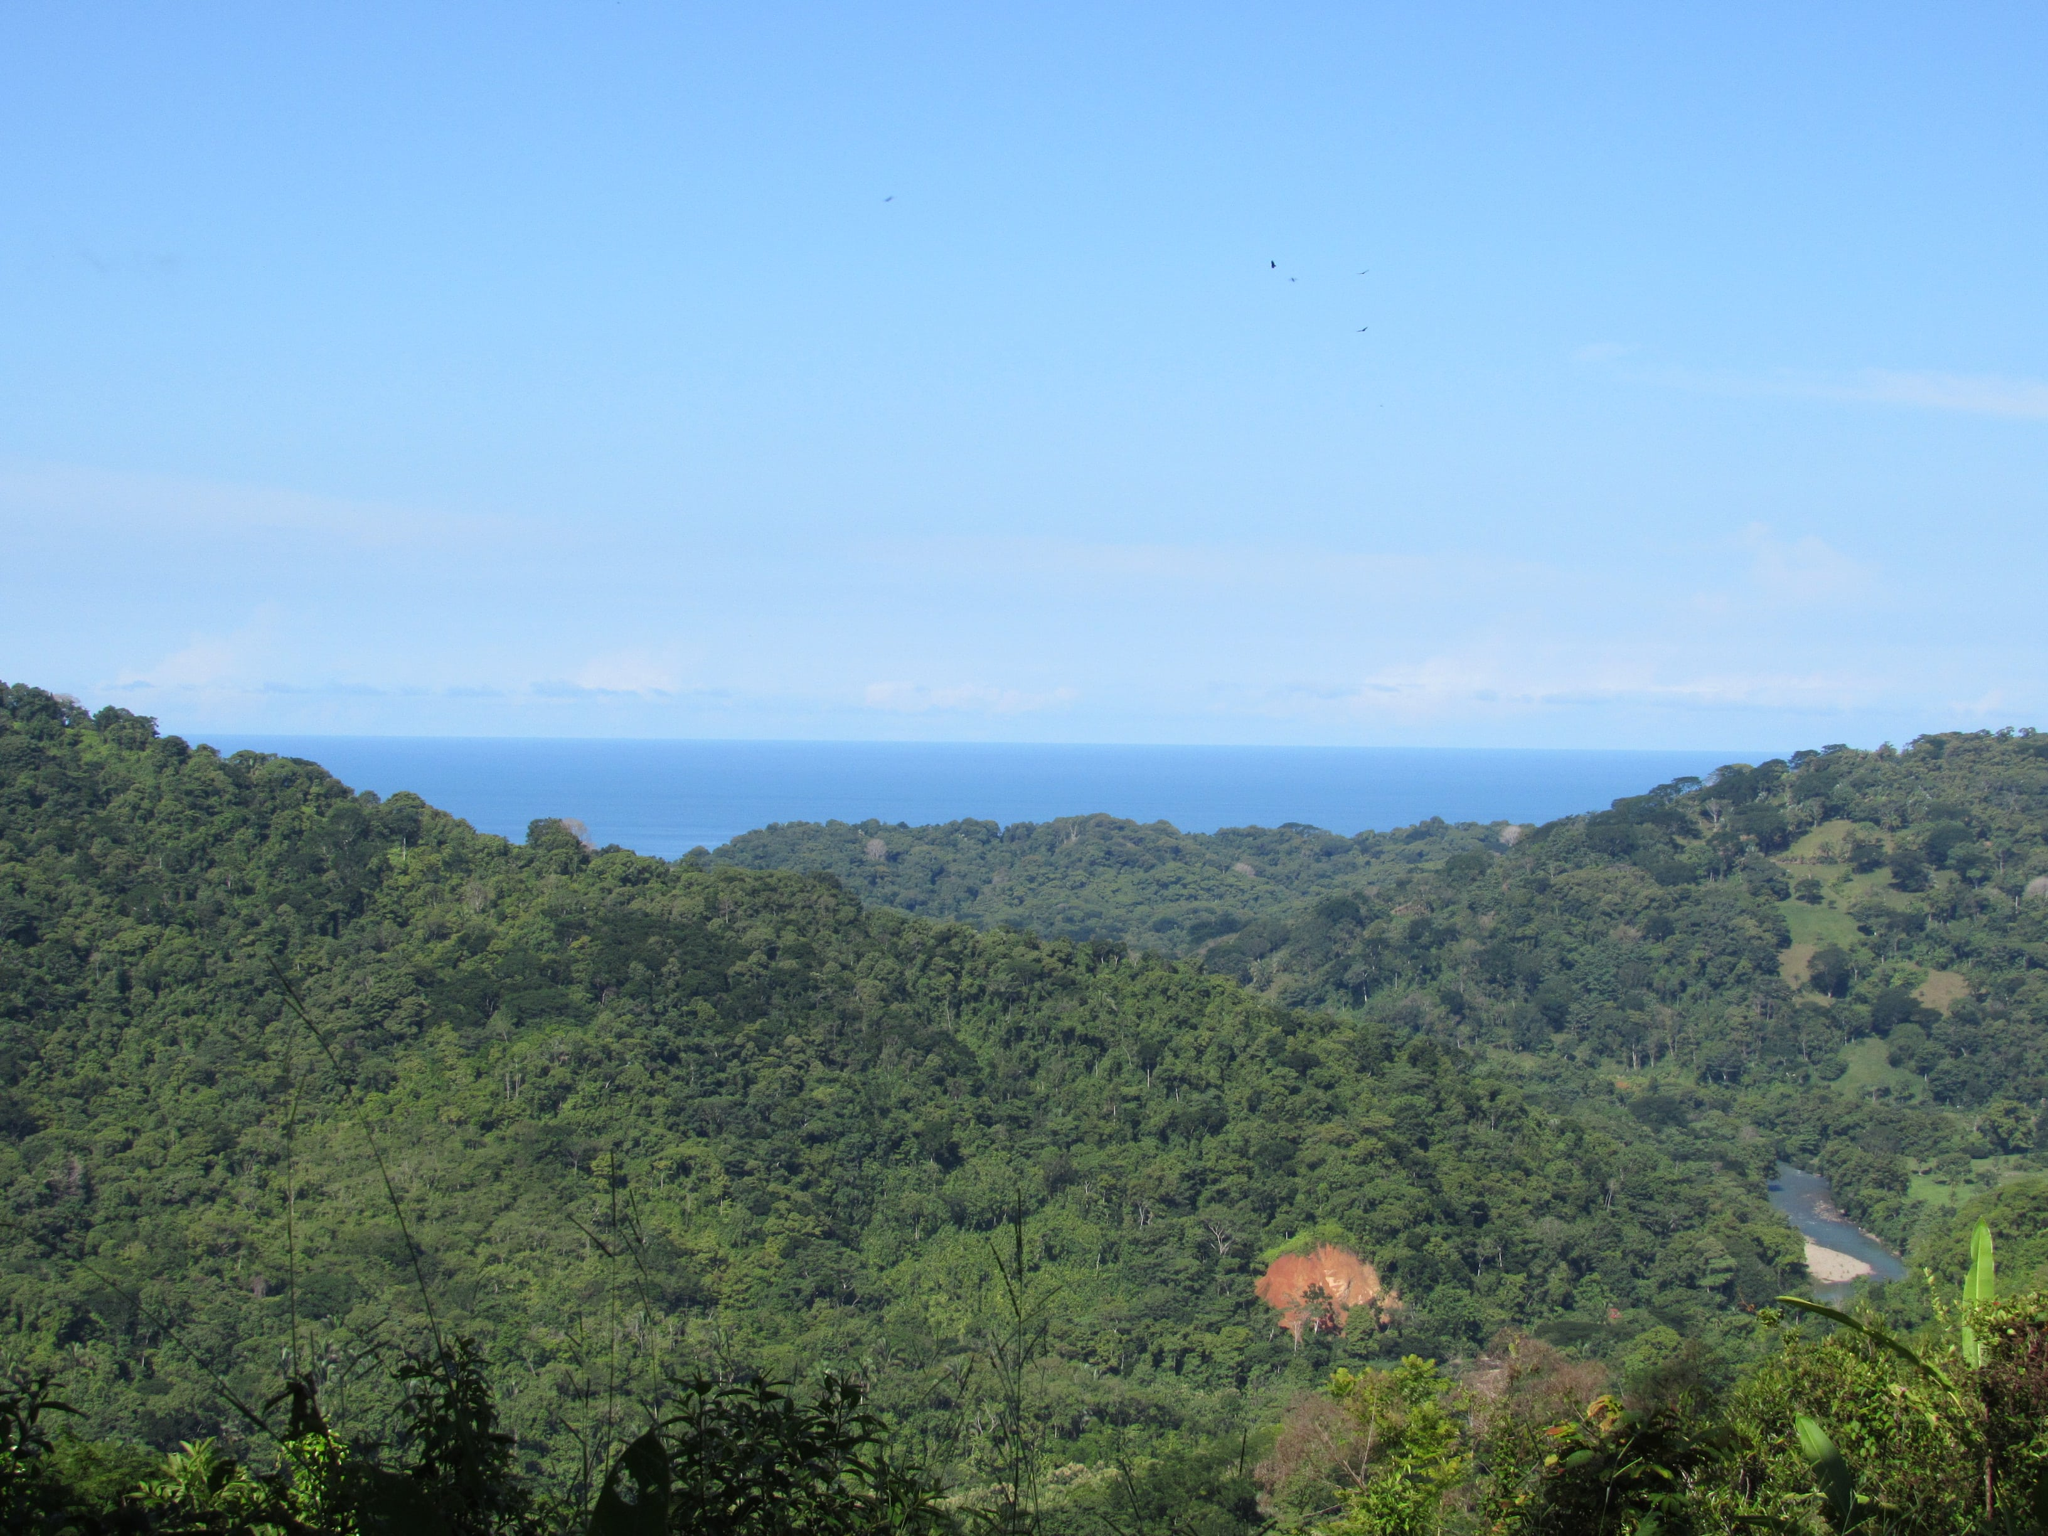 9 ACRES - Ocean View Property With Creek, Fruit Trees, Mulitple Building Sites, Open Acreage!